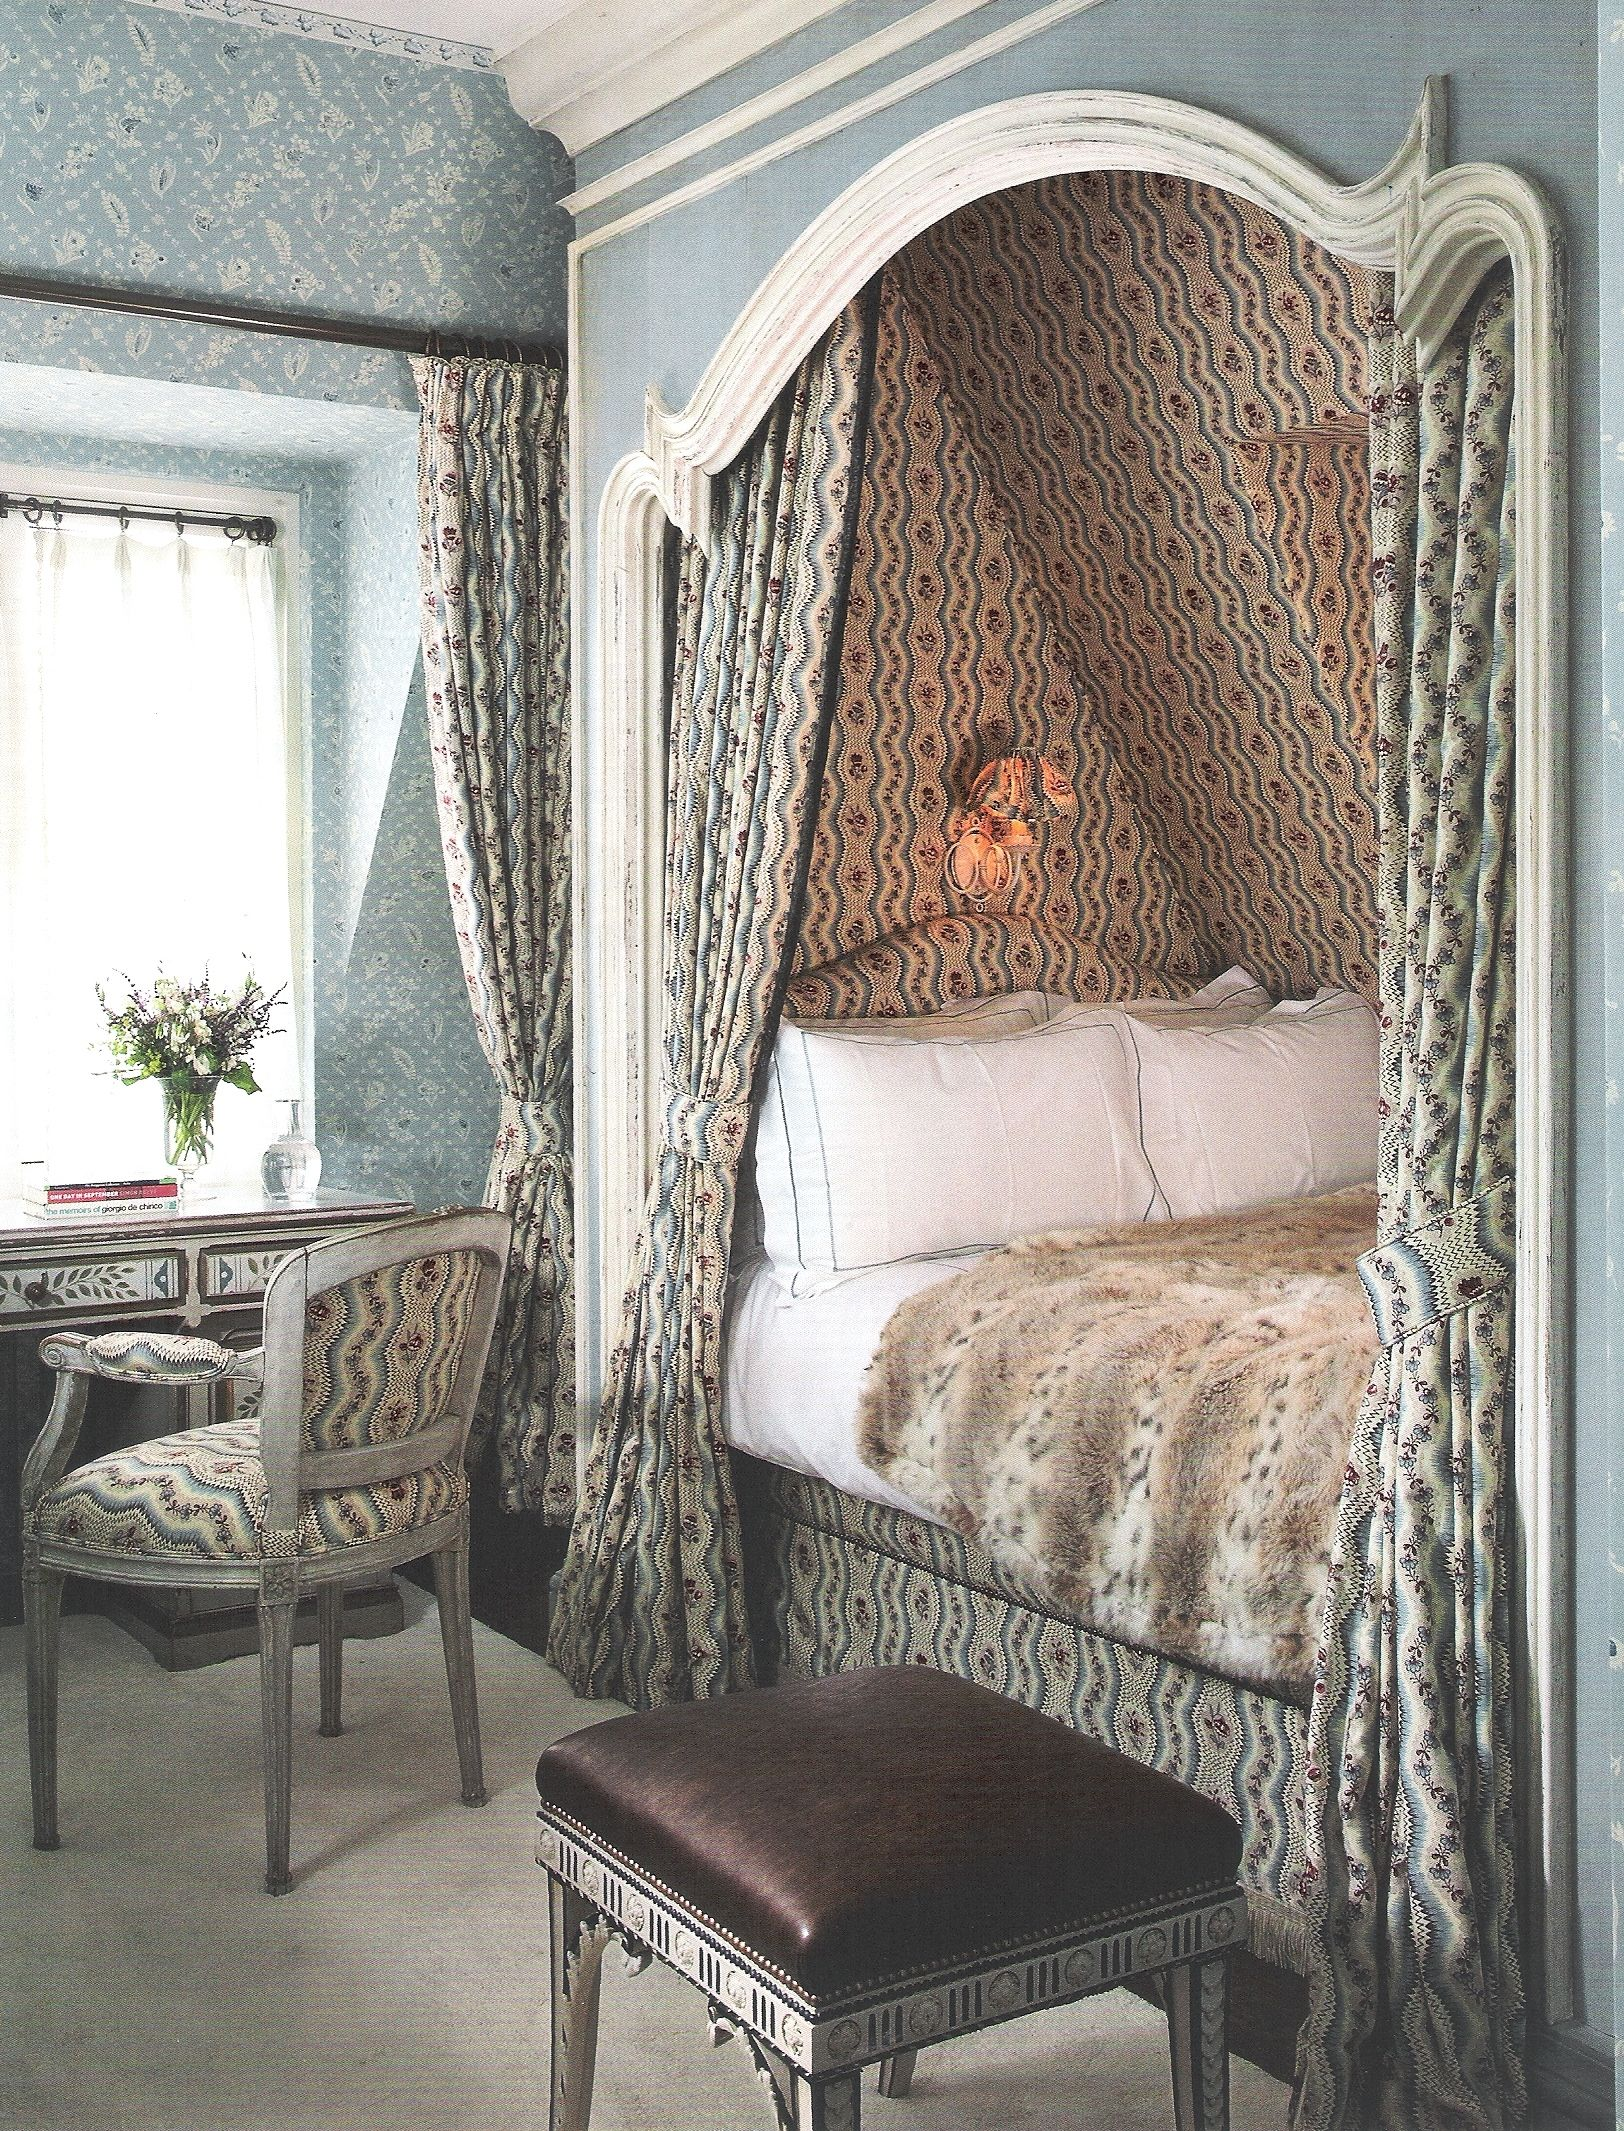 Alkoven Schlafzimmer  Alkoven Schlafzimmer Wohnideen Living Ideas